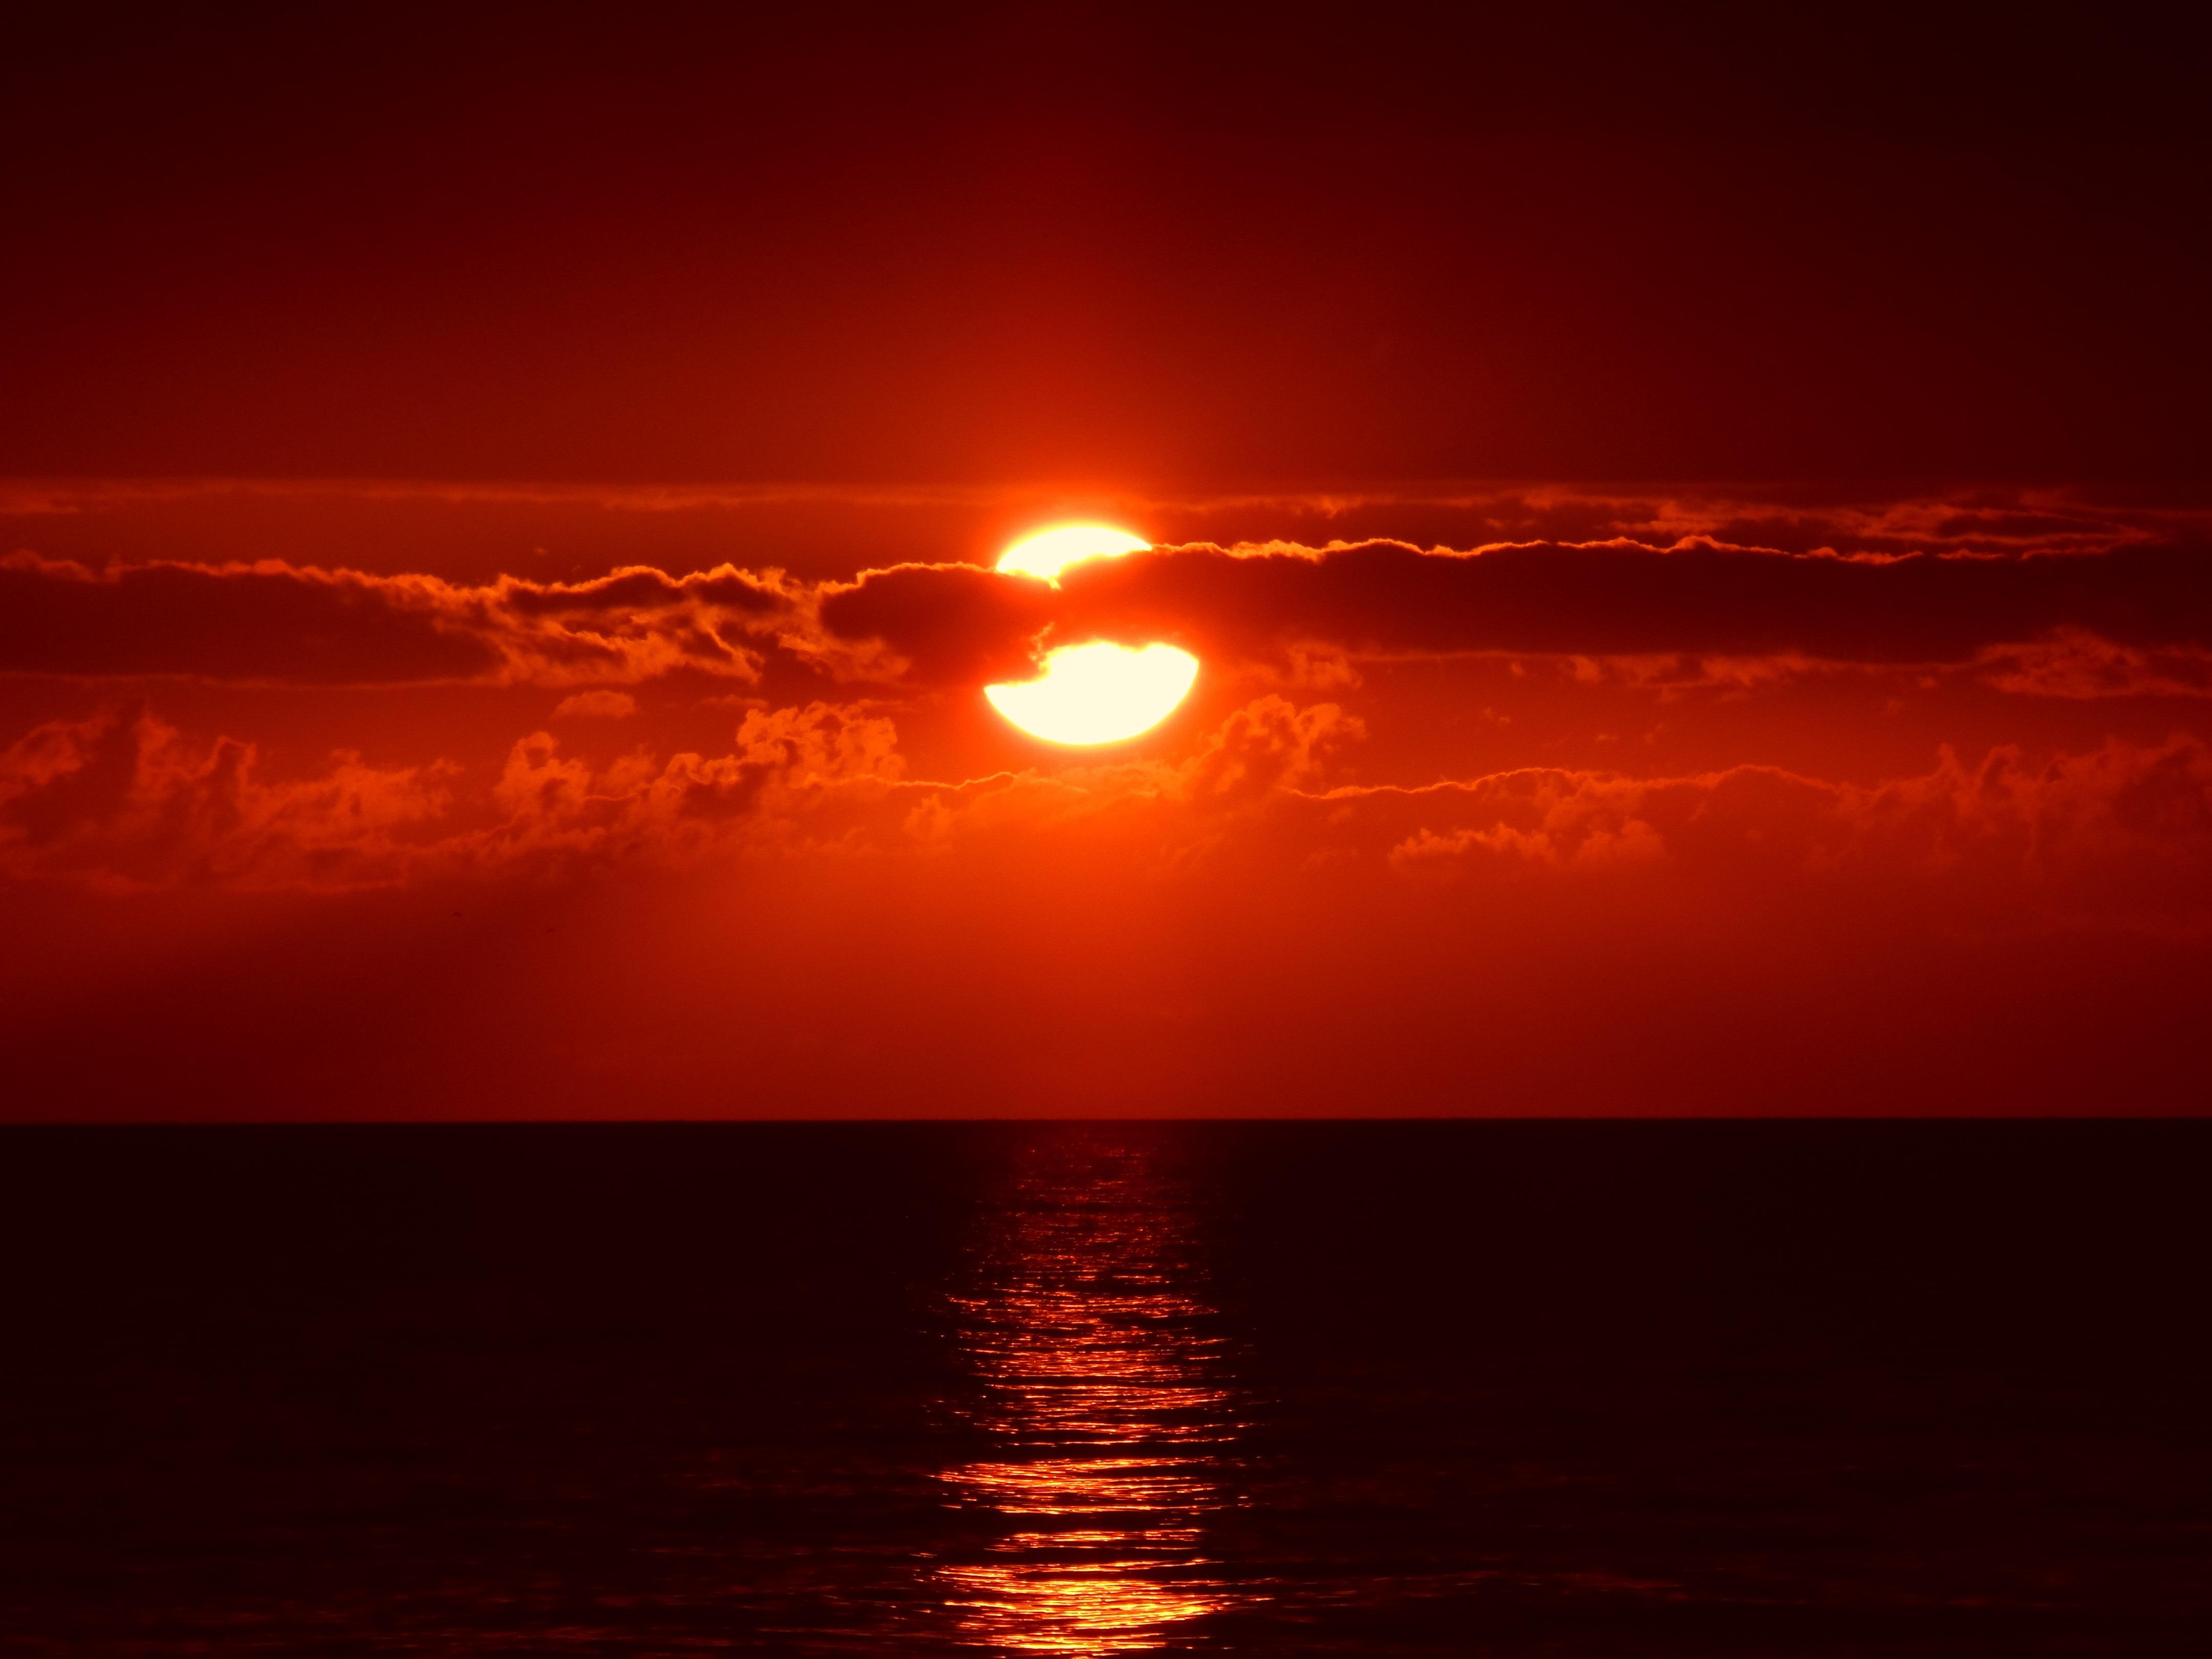 Sunset on the beach, sunset, beach, palm trees, sun, red, orange, sea, water, vegetation